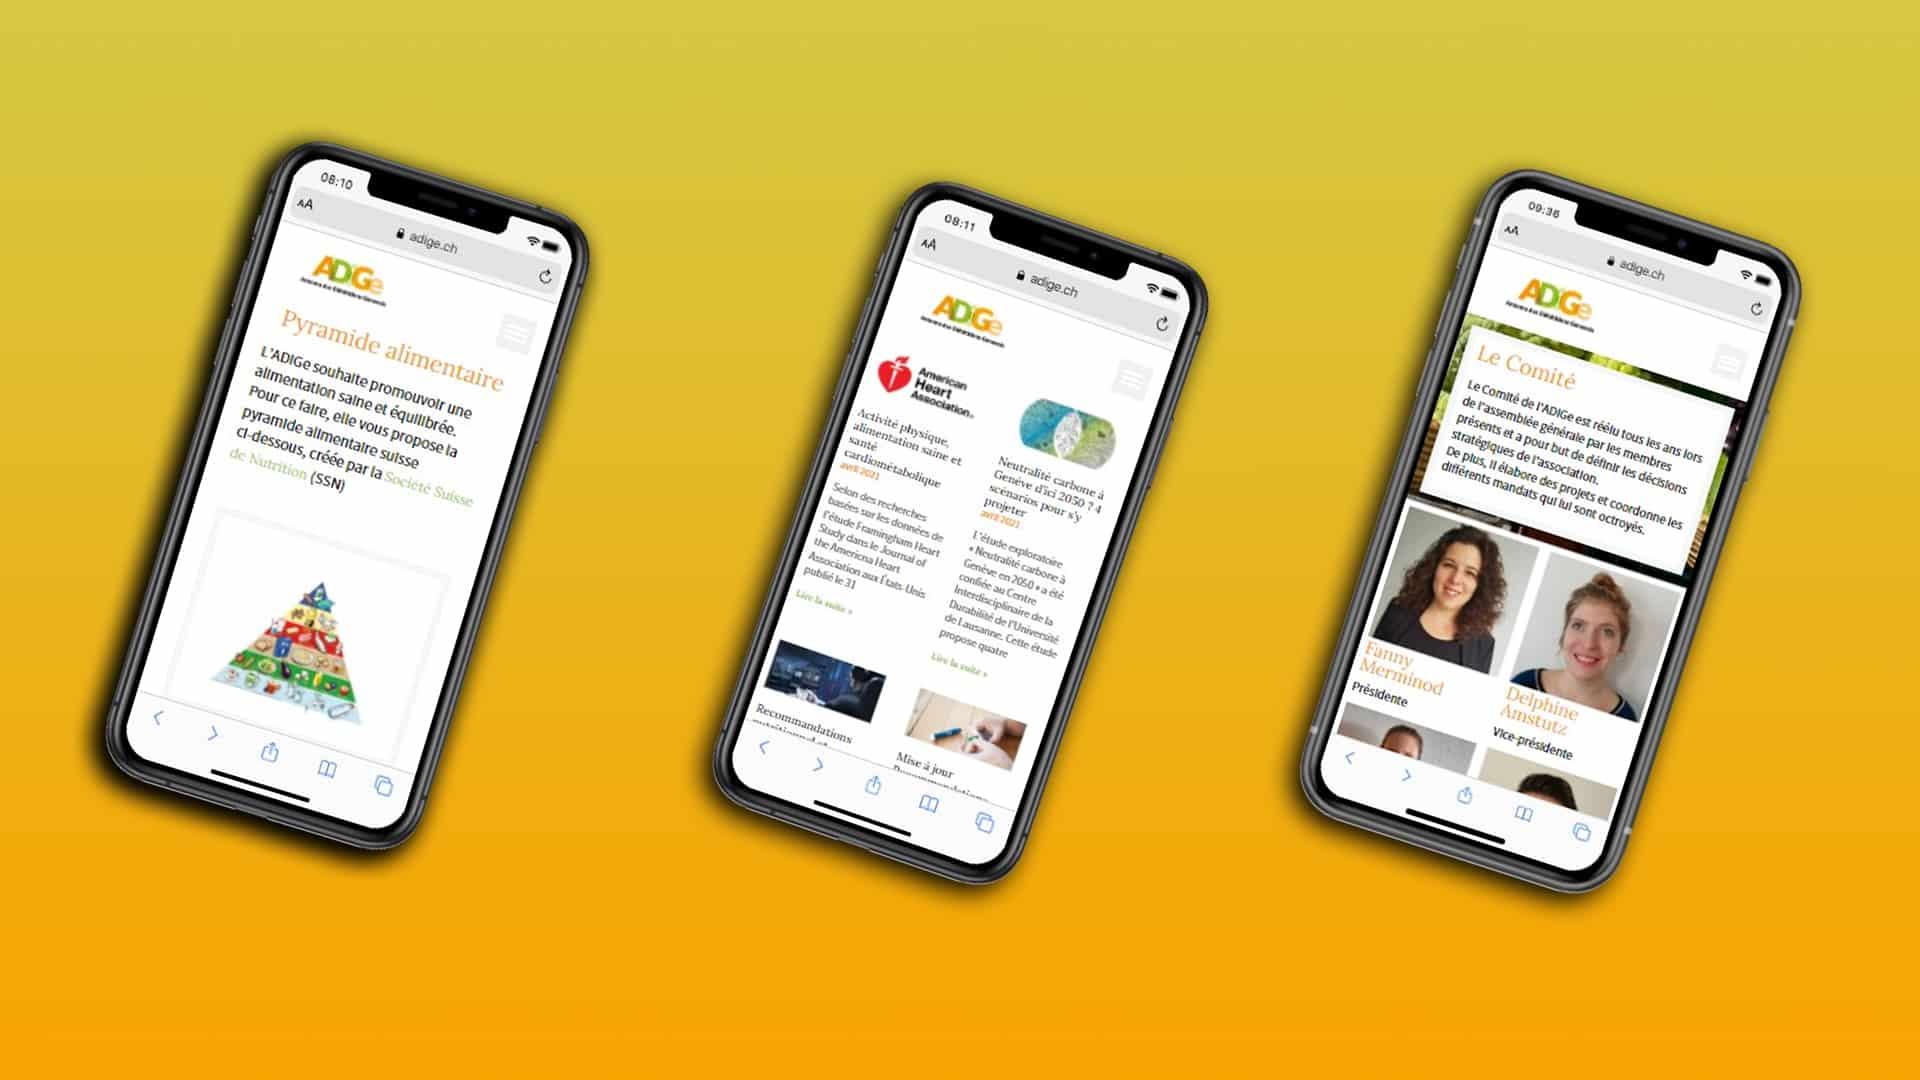 Adige les écrans su site wordpress sont ici en version smartphone